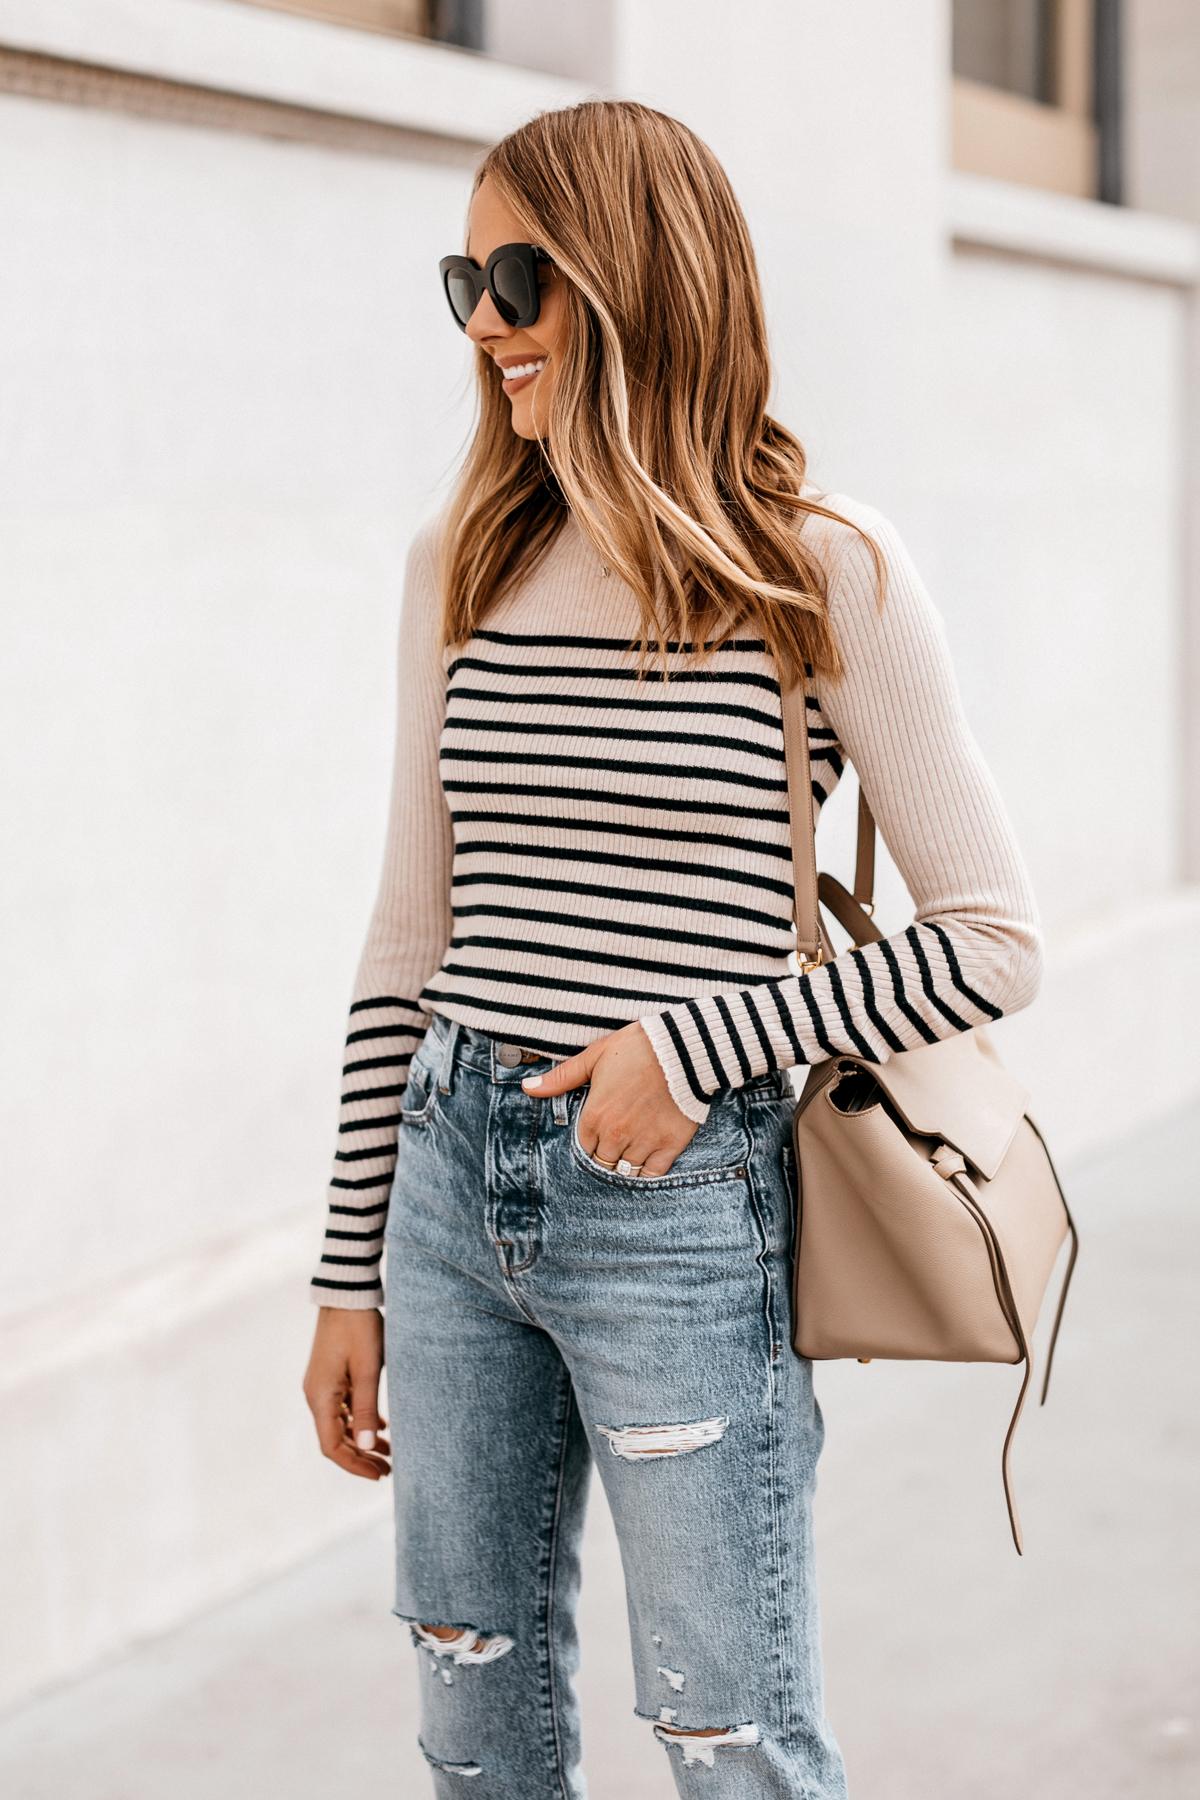 Fashion Jackson Wearing Rag and Bone Striped Long Sleeve Top Frame Ripped Jeans Celine Belt Bag